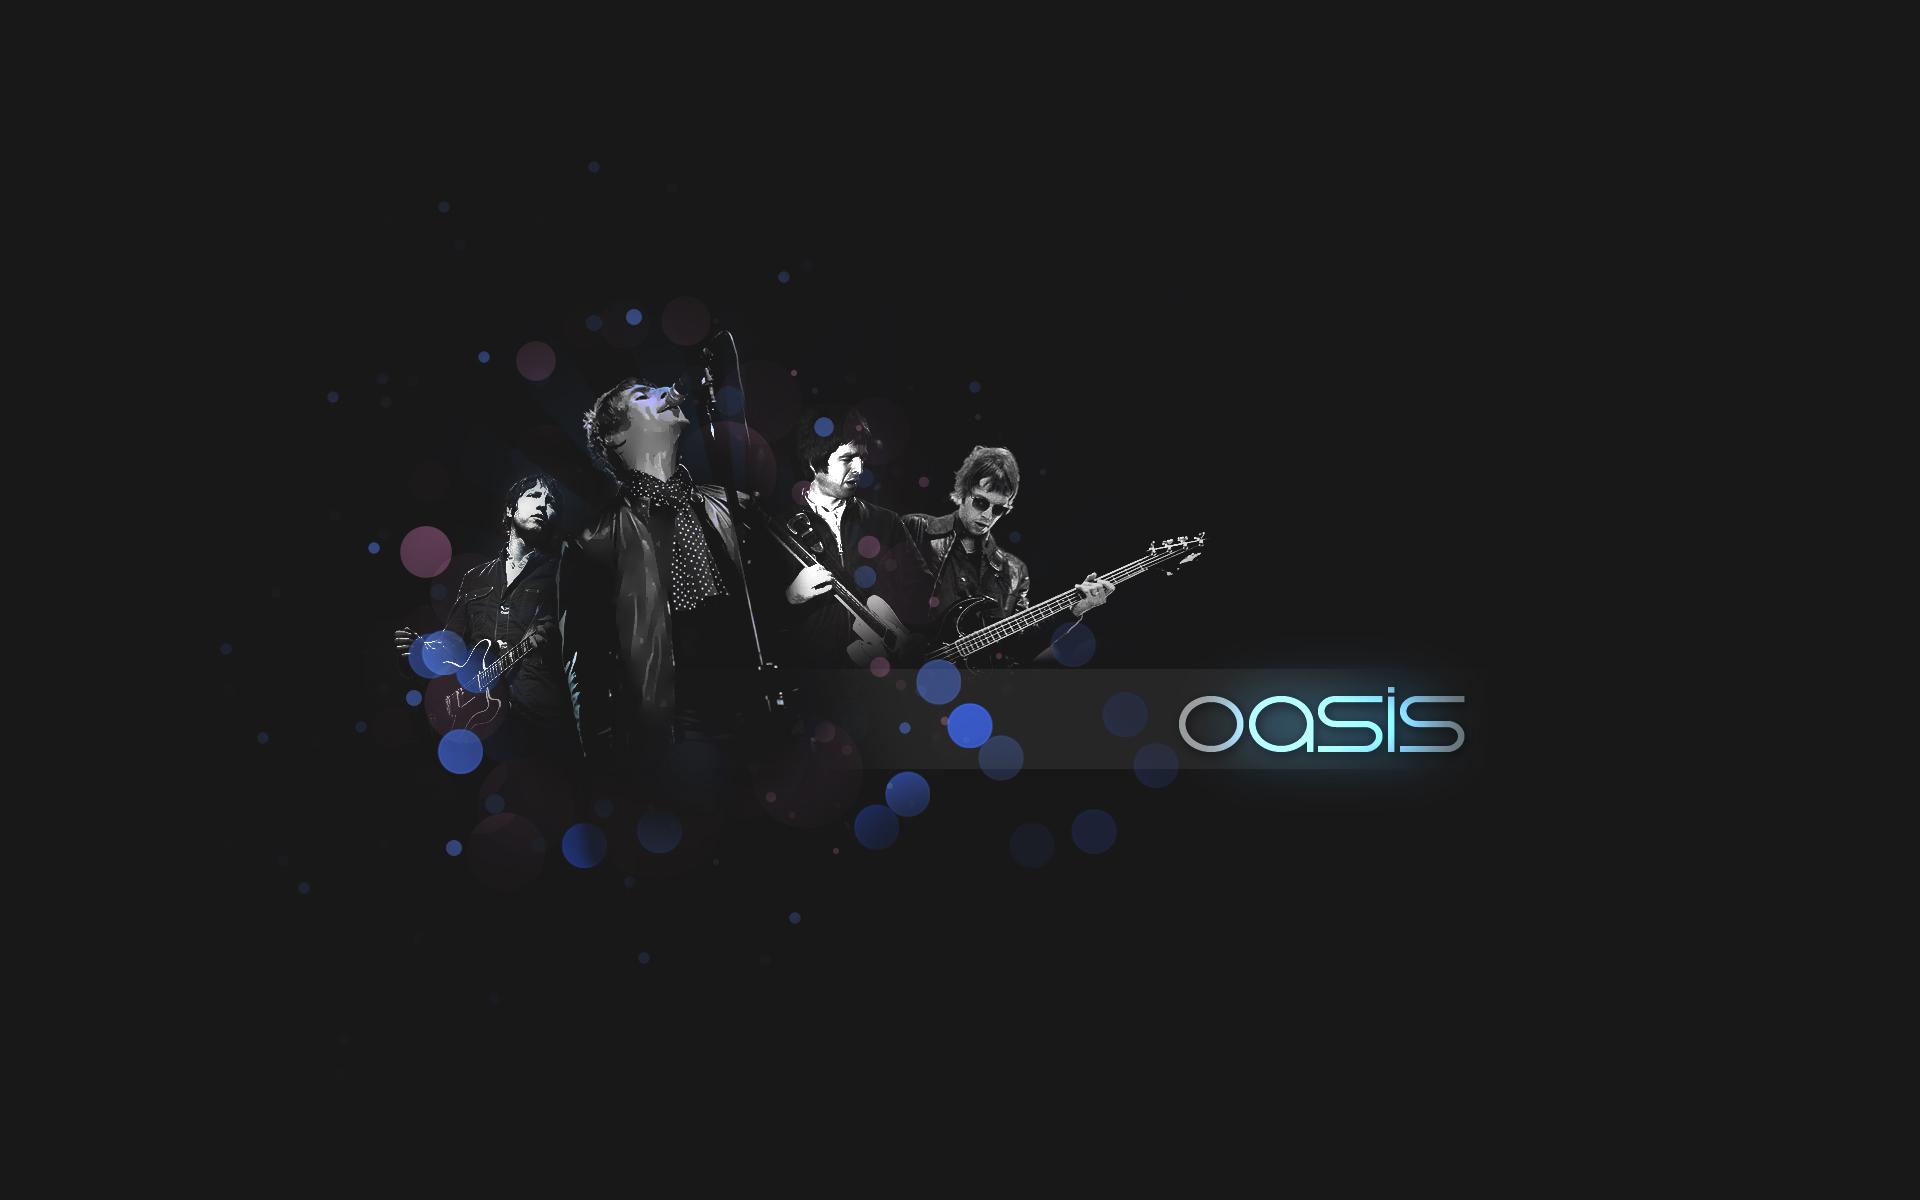 Oasis Wallpaper by SaintMichael on DeviantArt Oasis Band Wallpaper